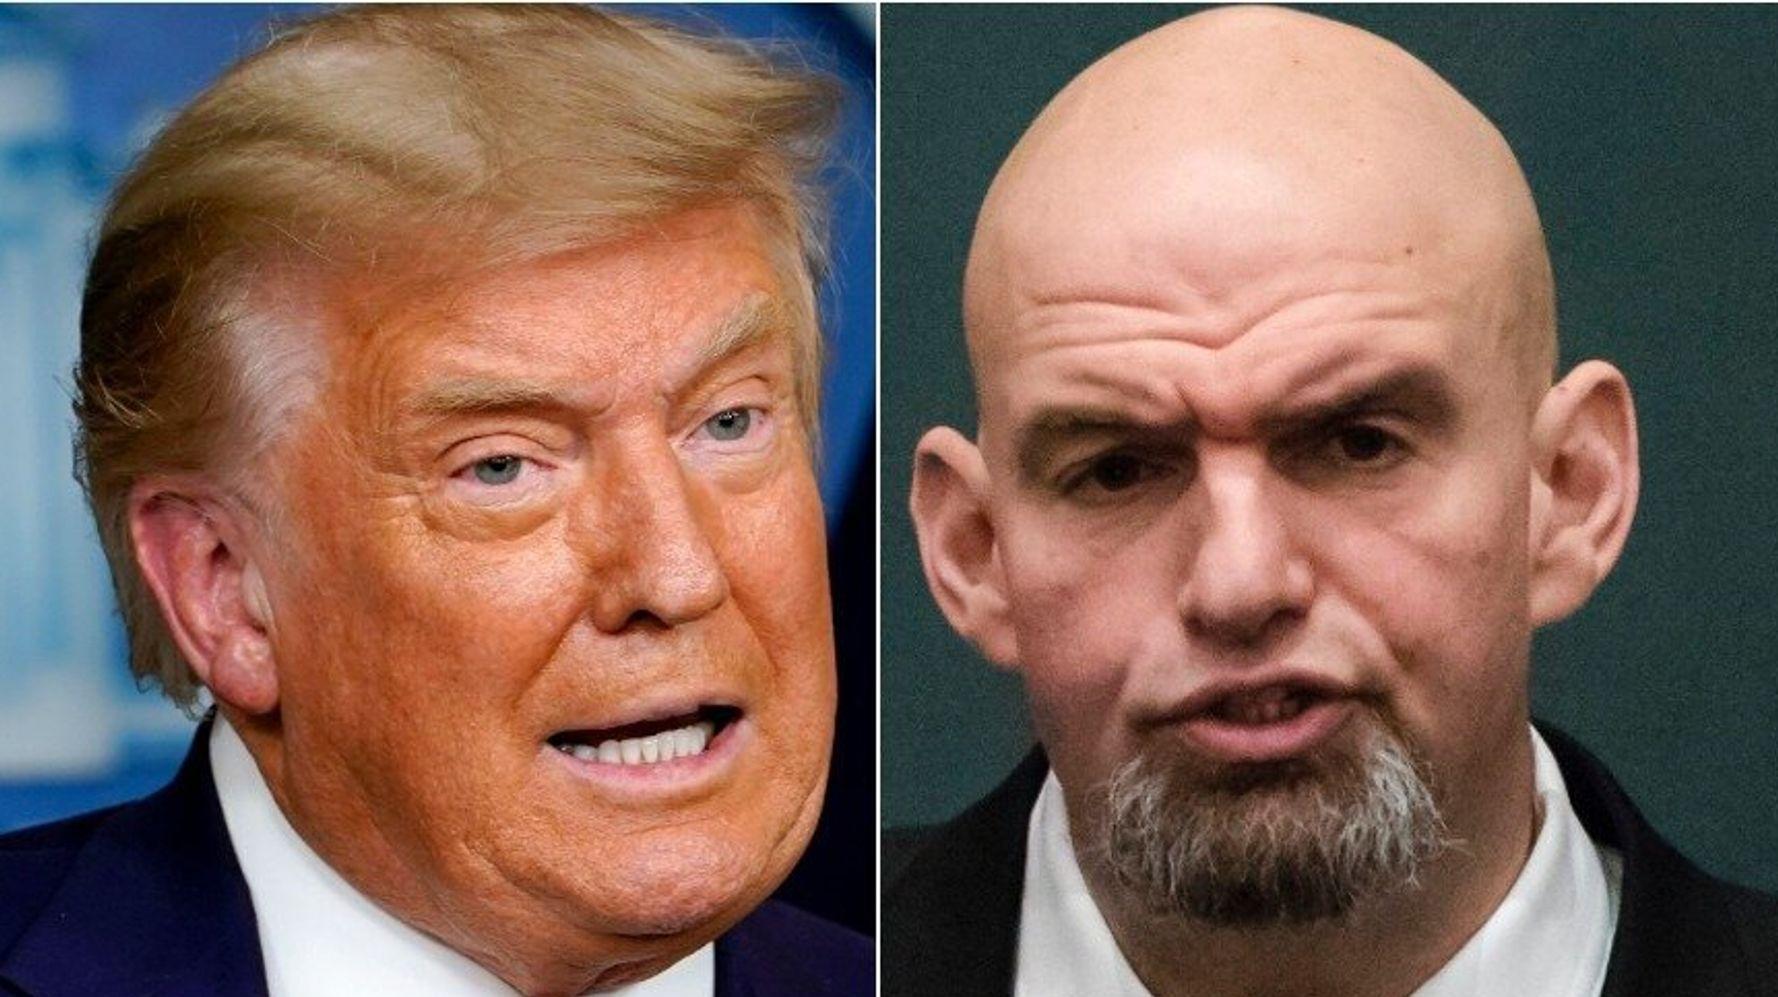 Pennsylvania's Lt. Gov. Trolls Trump, 'Dopey' GOP Lawsuits In Epic Tweetstorm